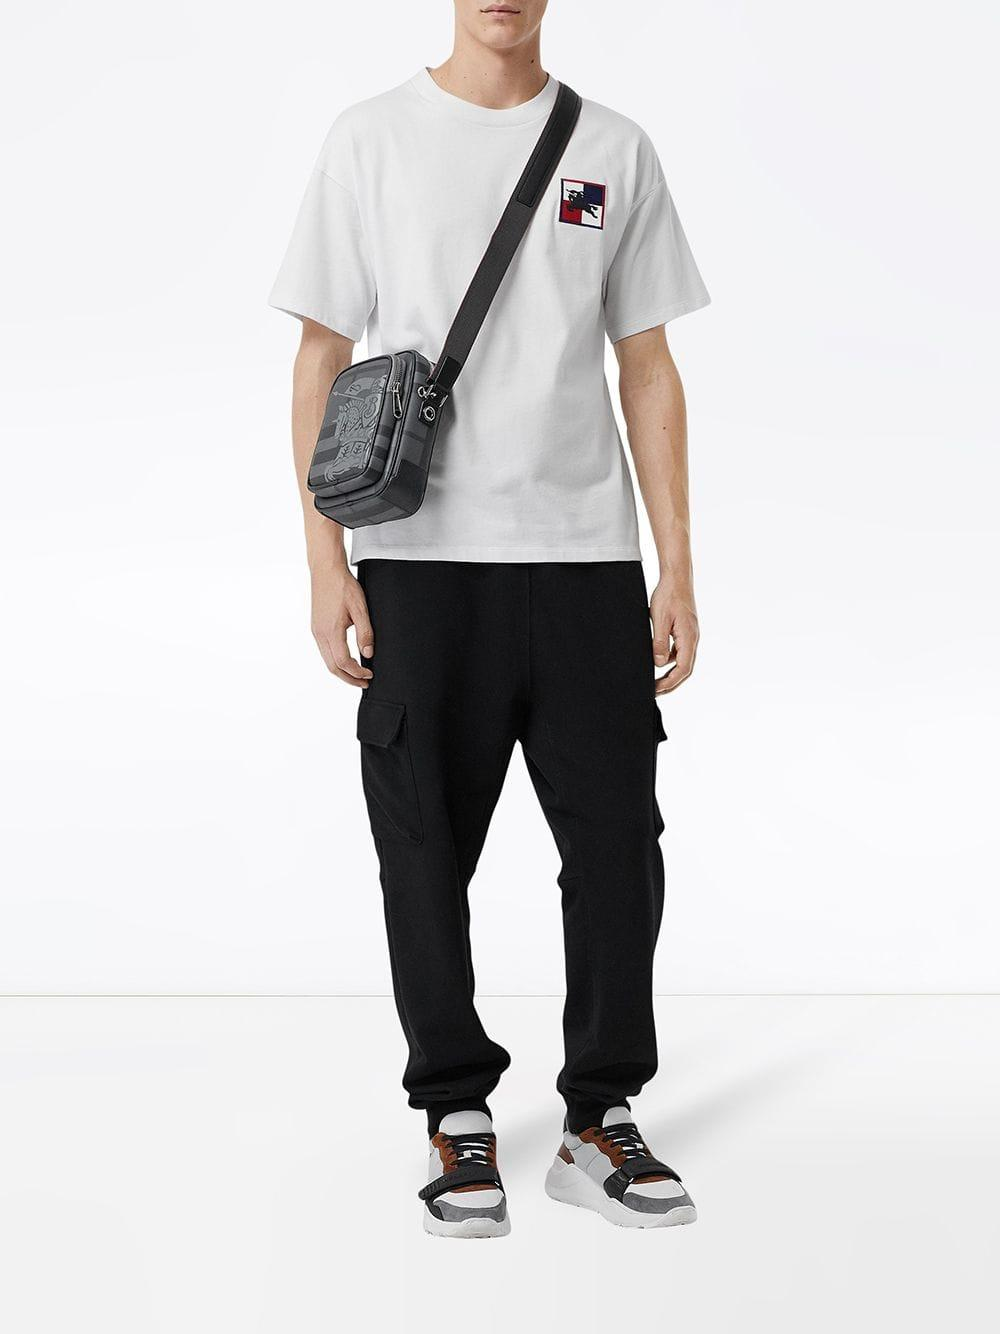 Burberry - Black Small Ekd London Check Crossbody Bag for Men - Lyst. View  fullscreen aa24c8321b742